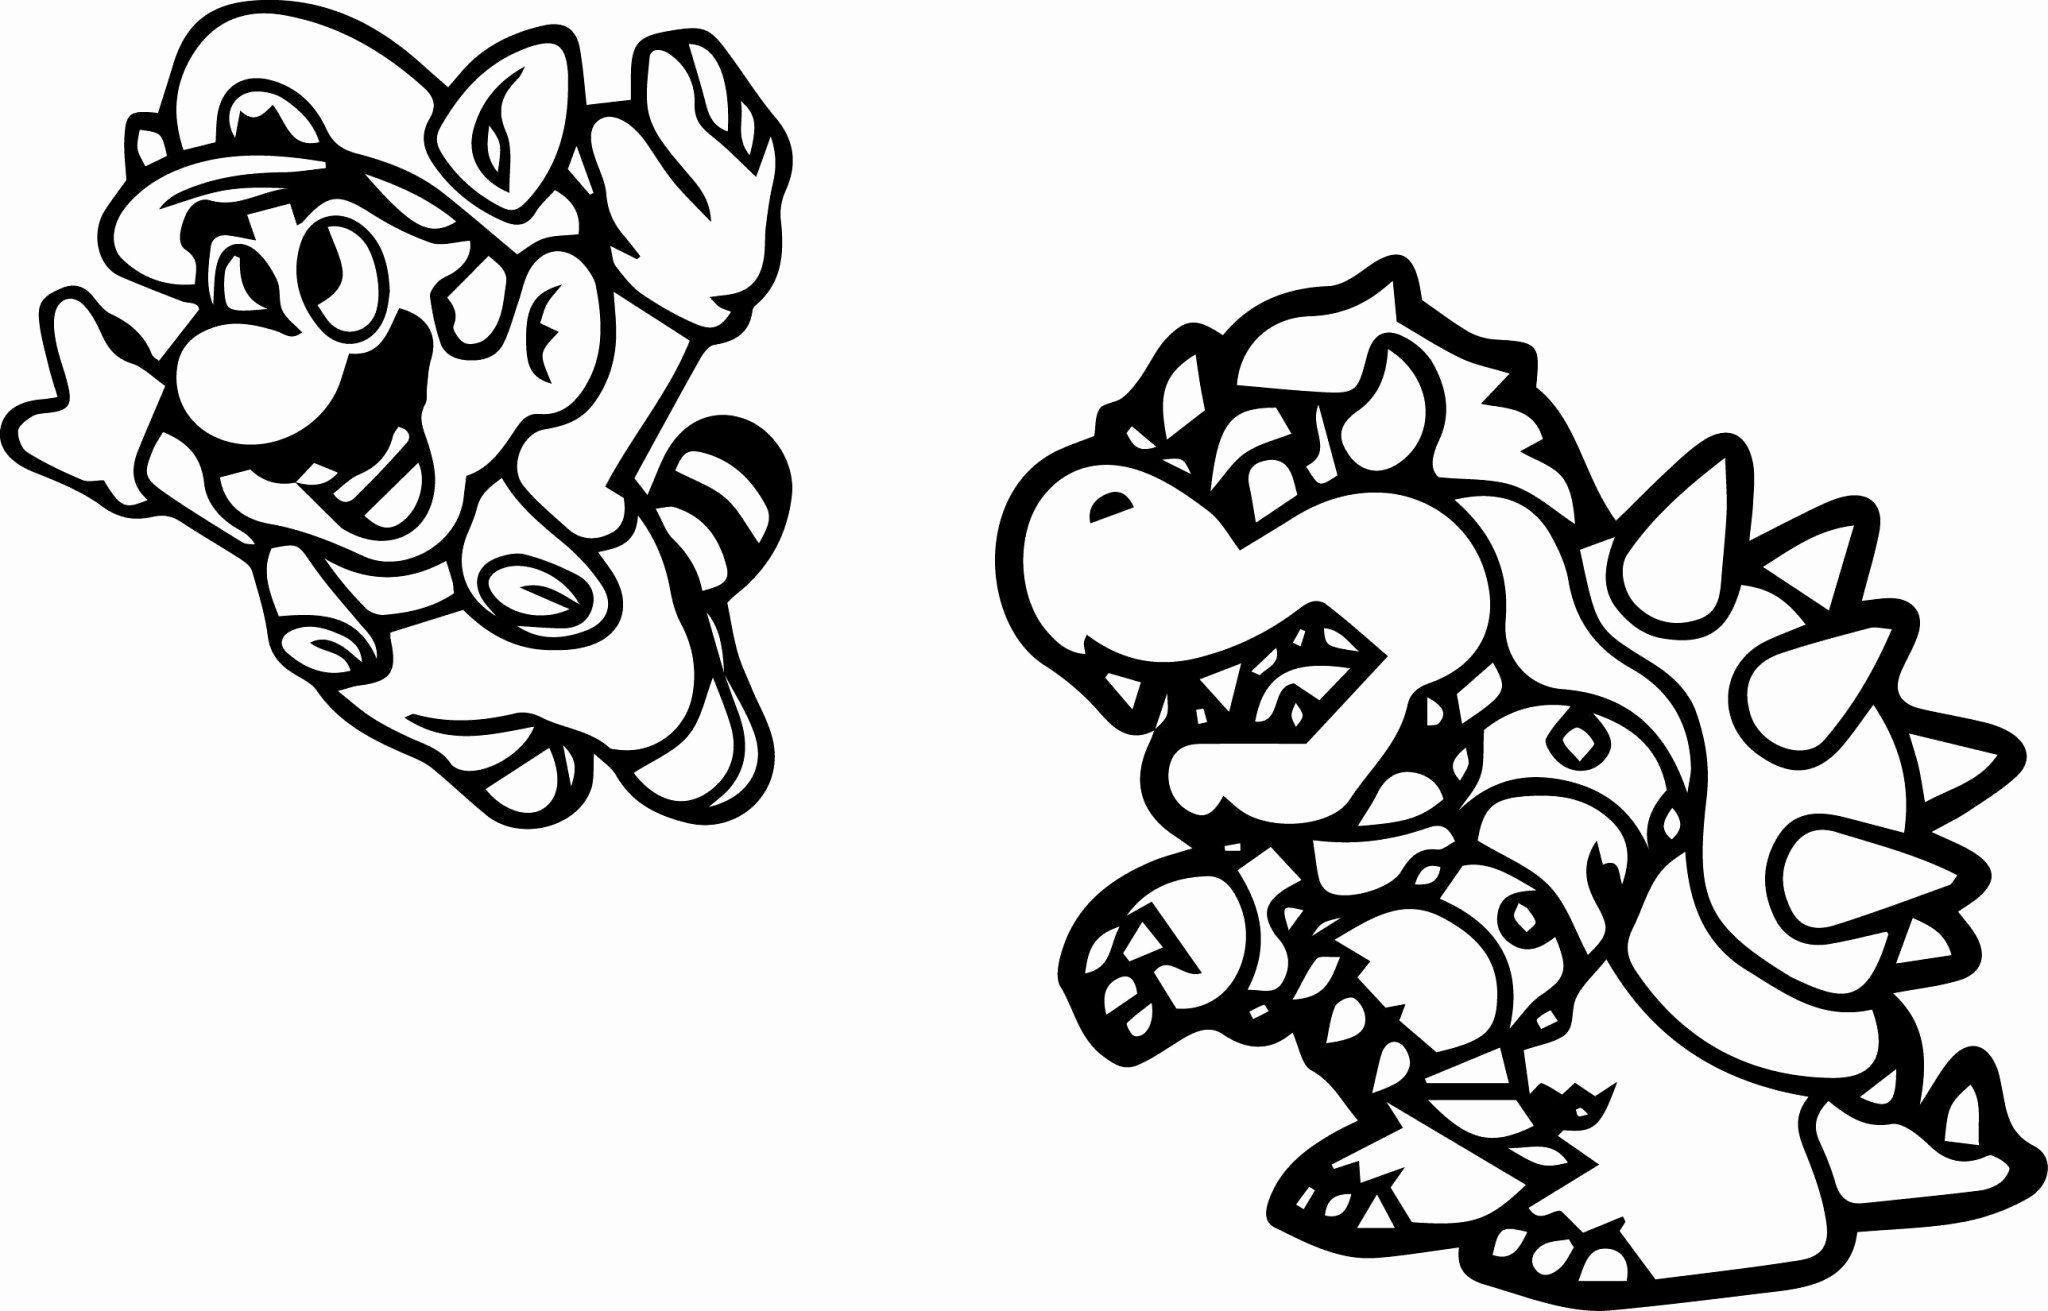 Mario Christmas Coloring Pages Beautiful Plan Mario Coloring Page Financialsolutionsub